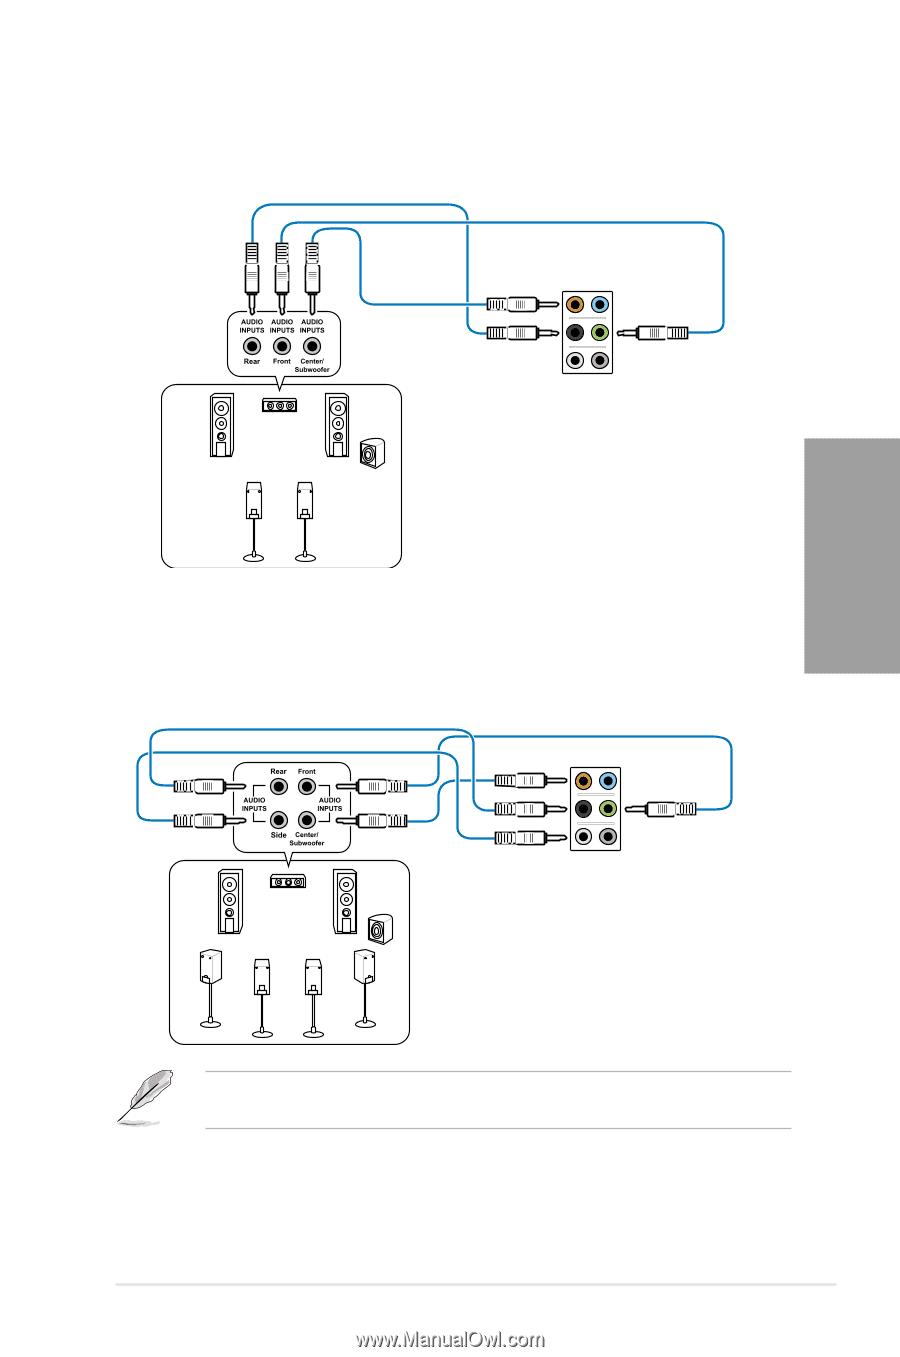 asus p8z68 v block diagram asus p8z68 v pro gen3 user manual page 66  asus p8z68 v pro gen3 user manual